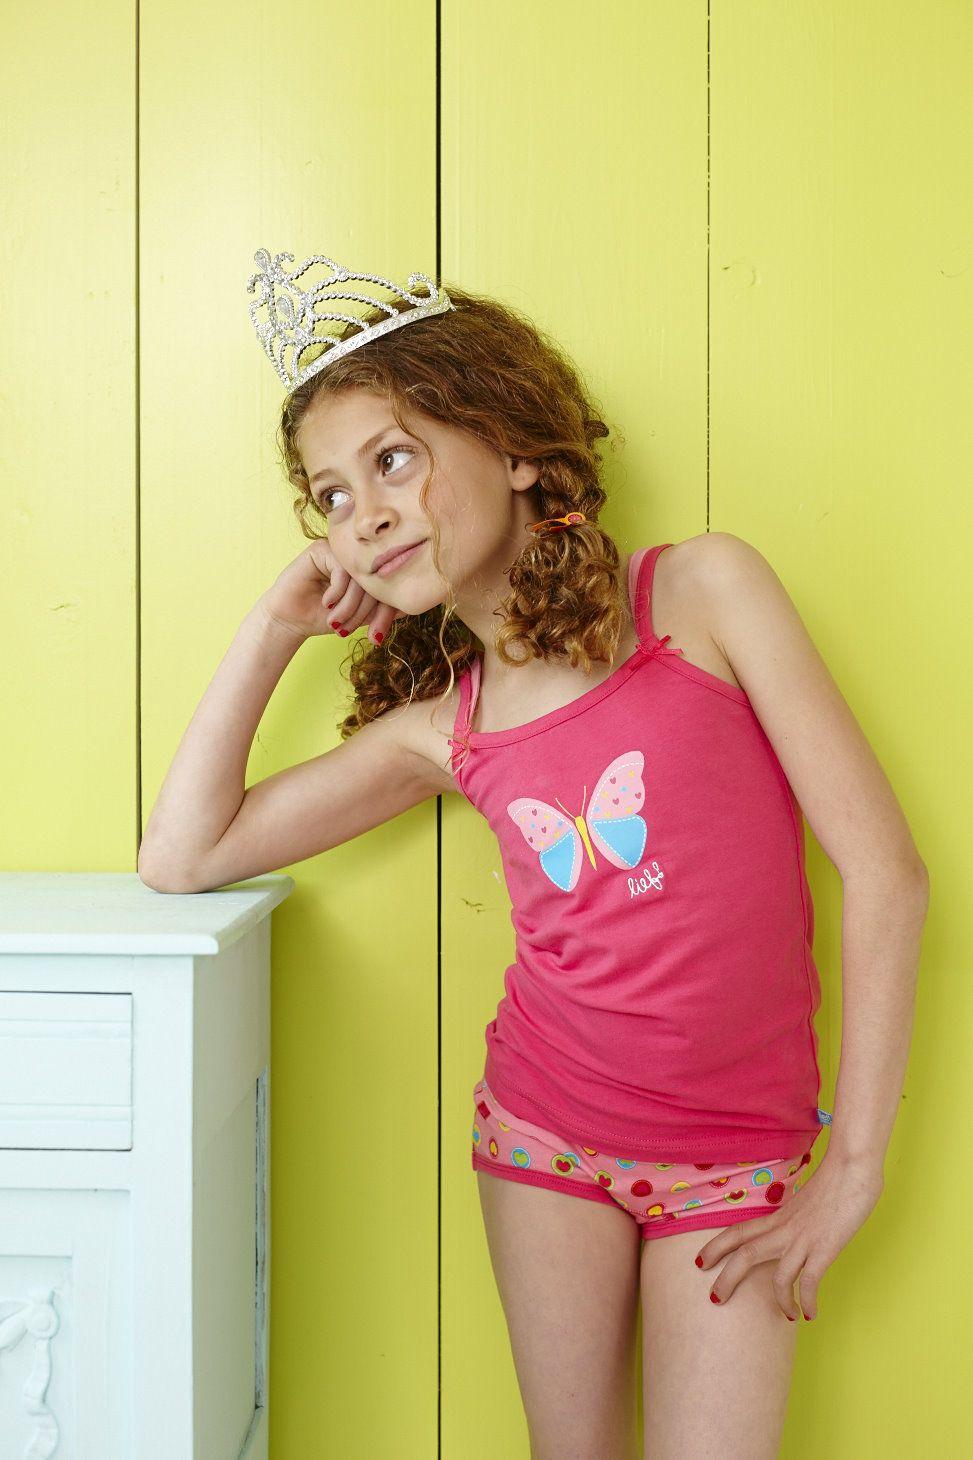 Meisjes Ondergoed Lief Lifestyle Zomer 2014 Www